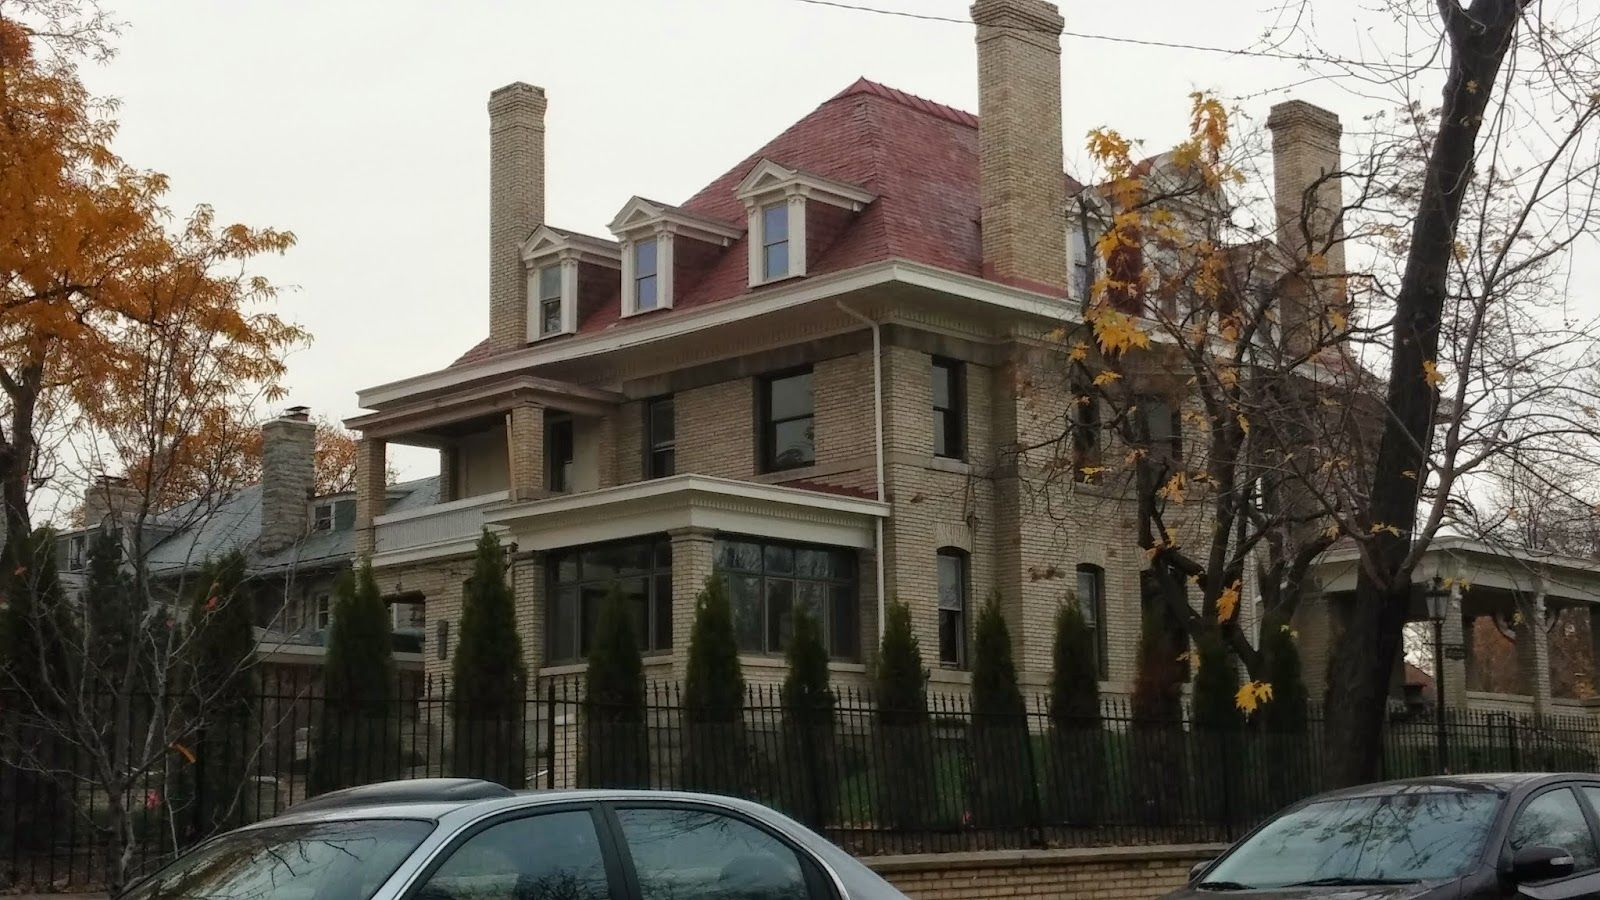 1904 Summit Avenue Mansion St Paul Mn Rehab Addict Rehab Addict Victorian Homes Nicole Curtis Rehab Addict